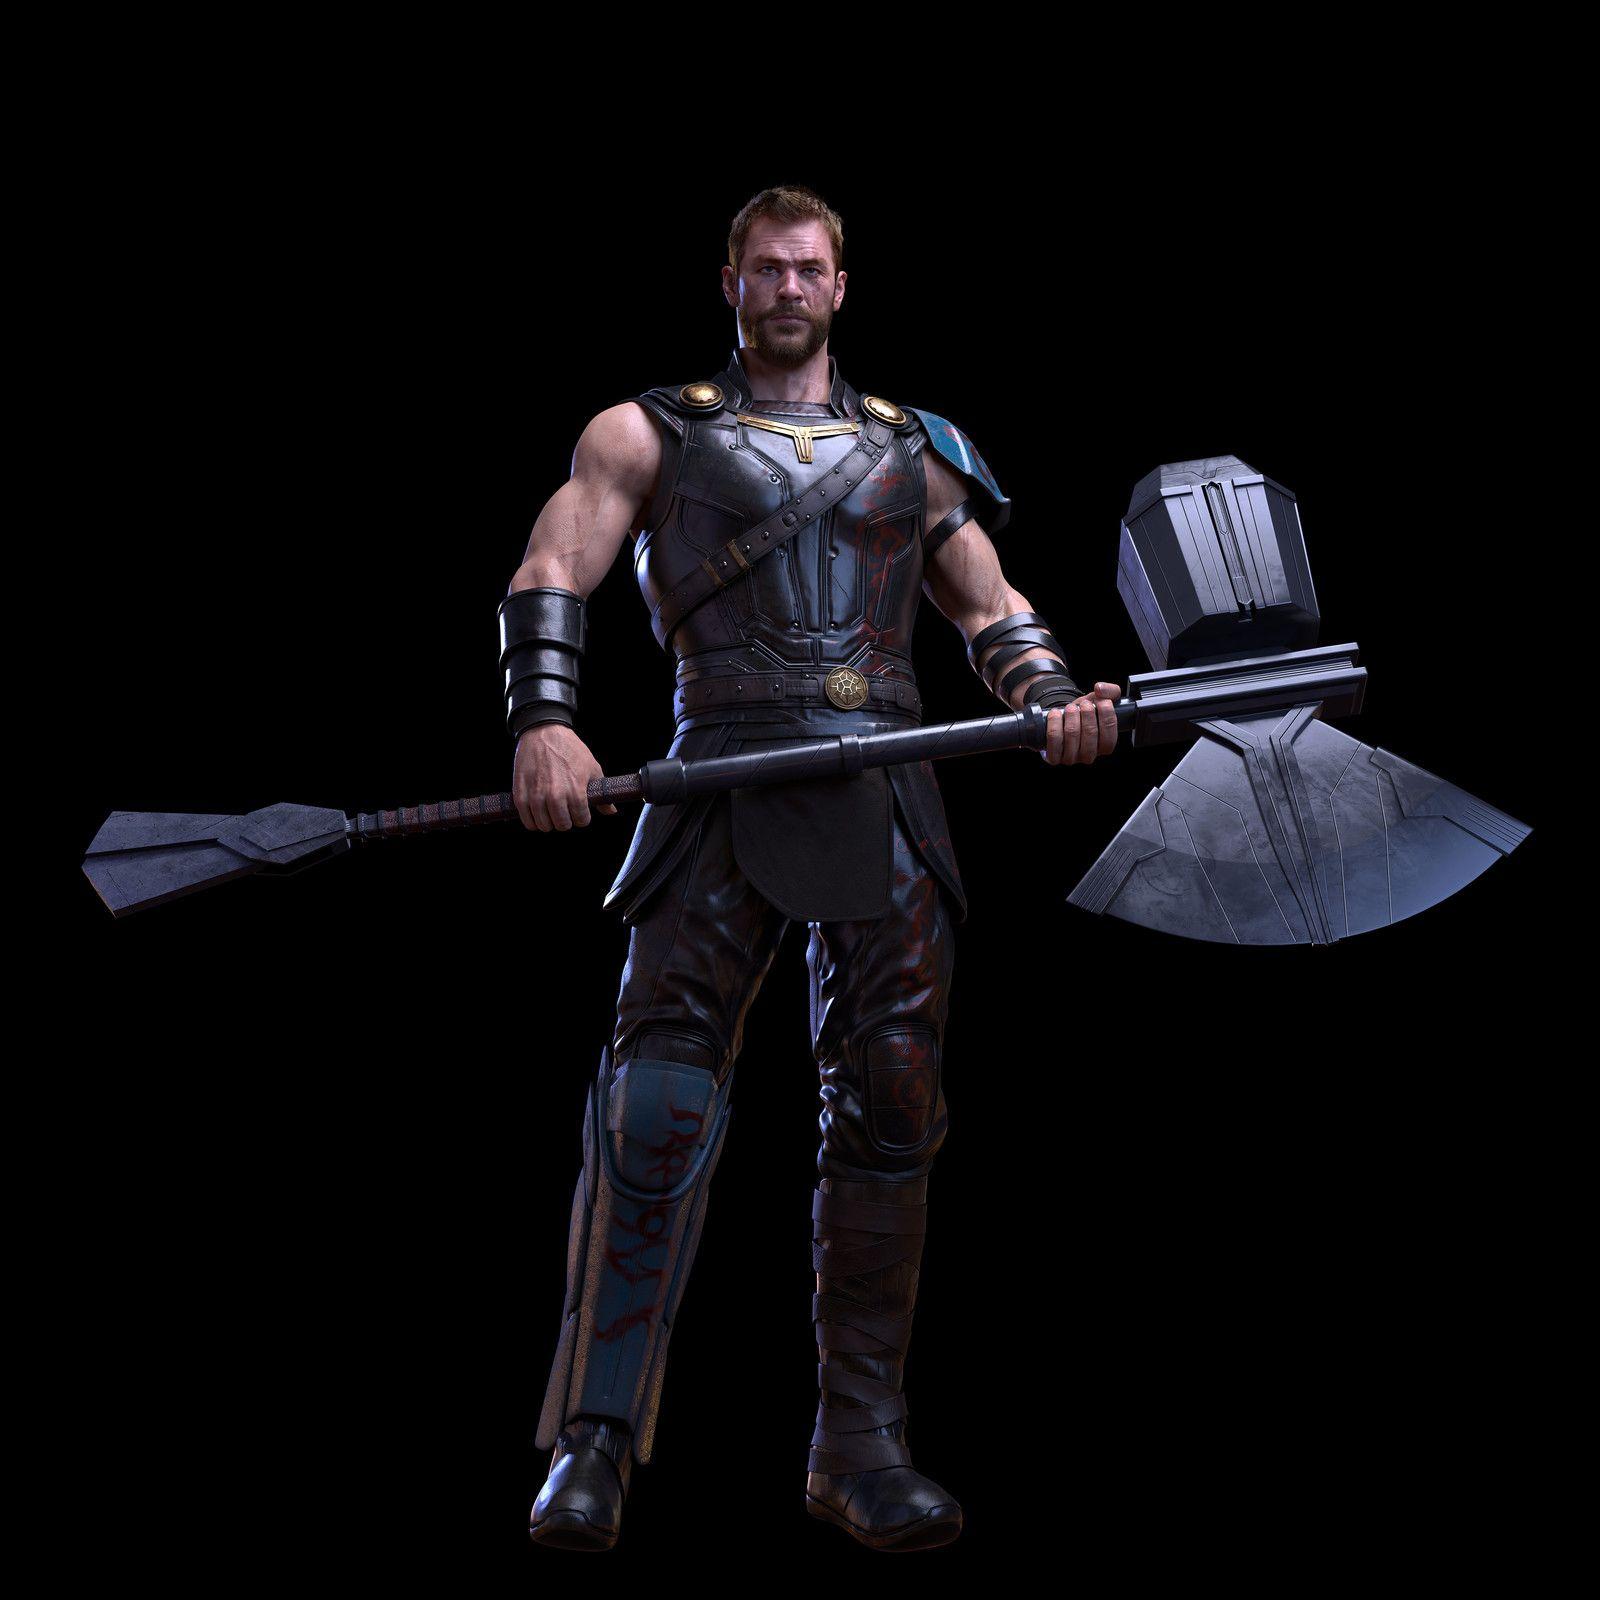 new hammer thor fanart xie boli on artstation at https www